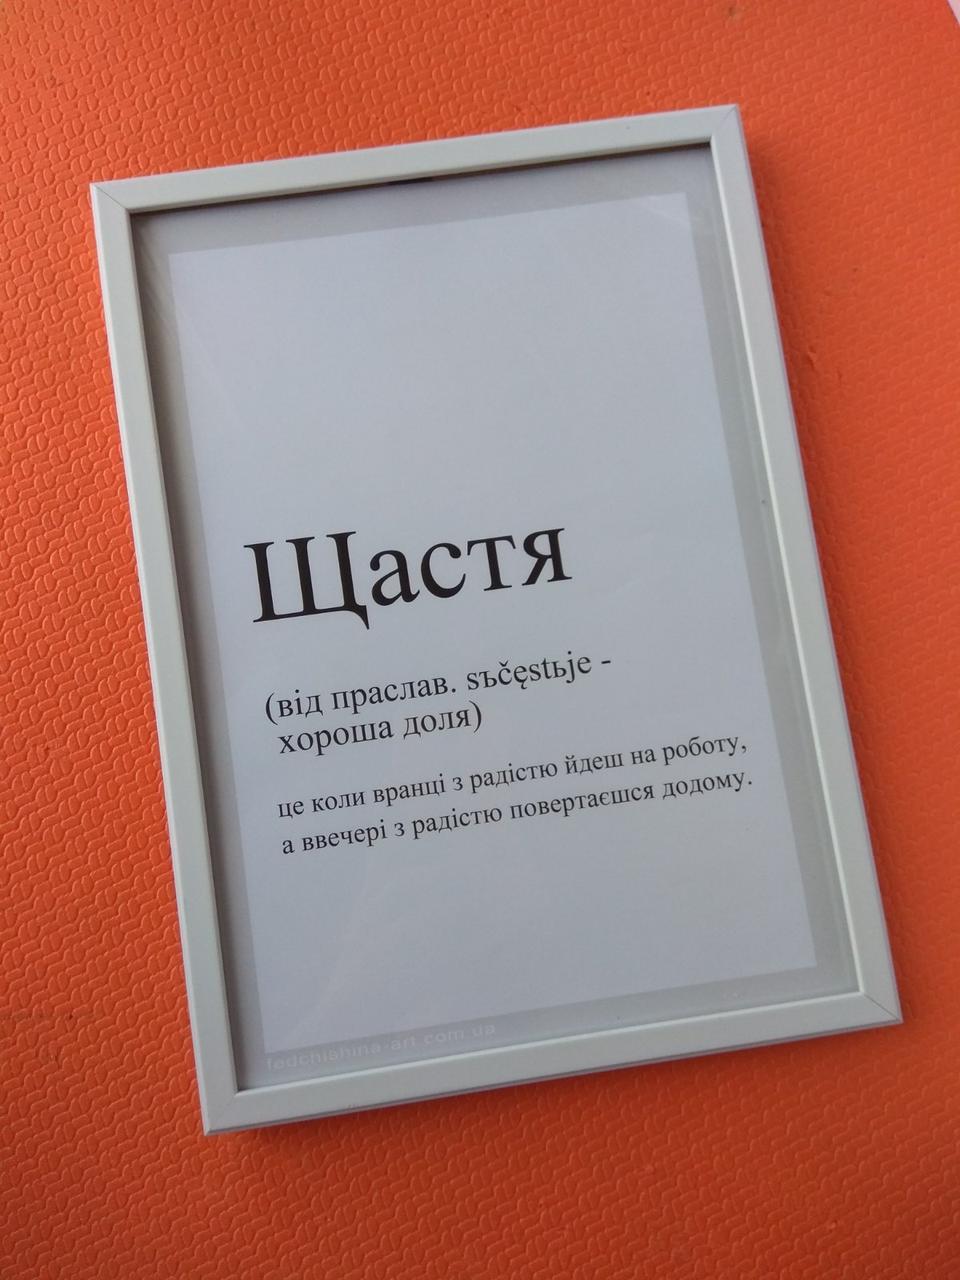 Плакат постер в раме на стену А4 Щастя мотивирующий для дома, офиса на украинском